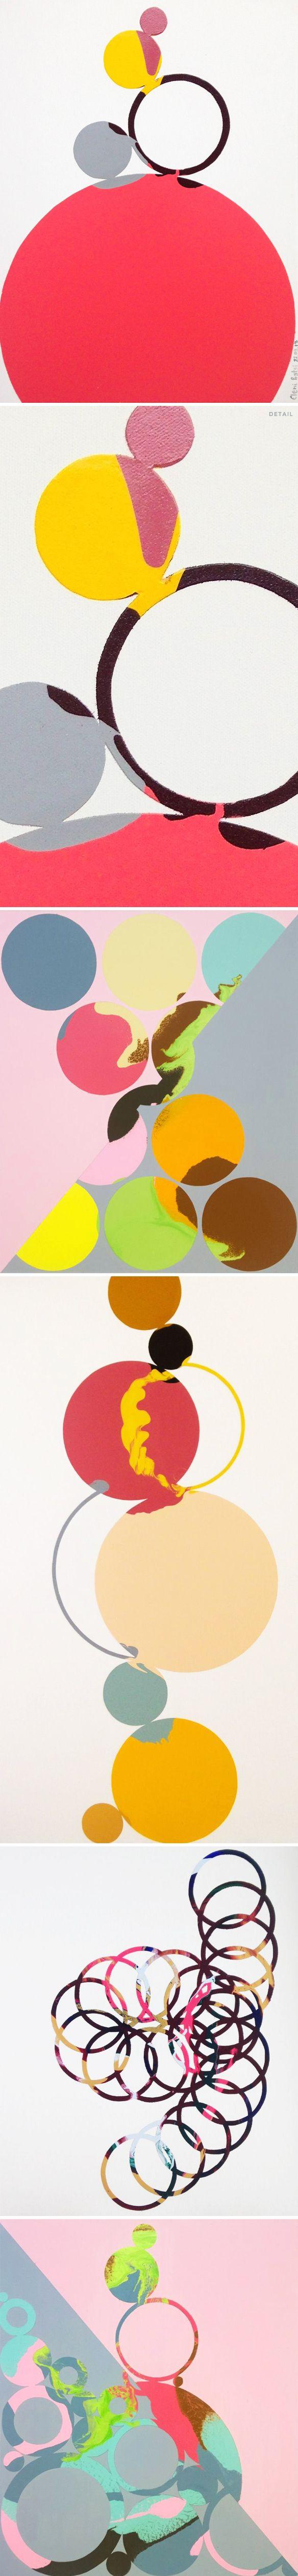 acrylic and oil paintings by eleni pratsi